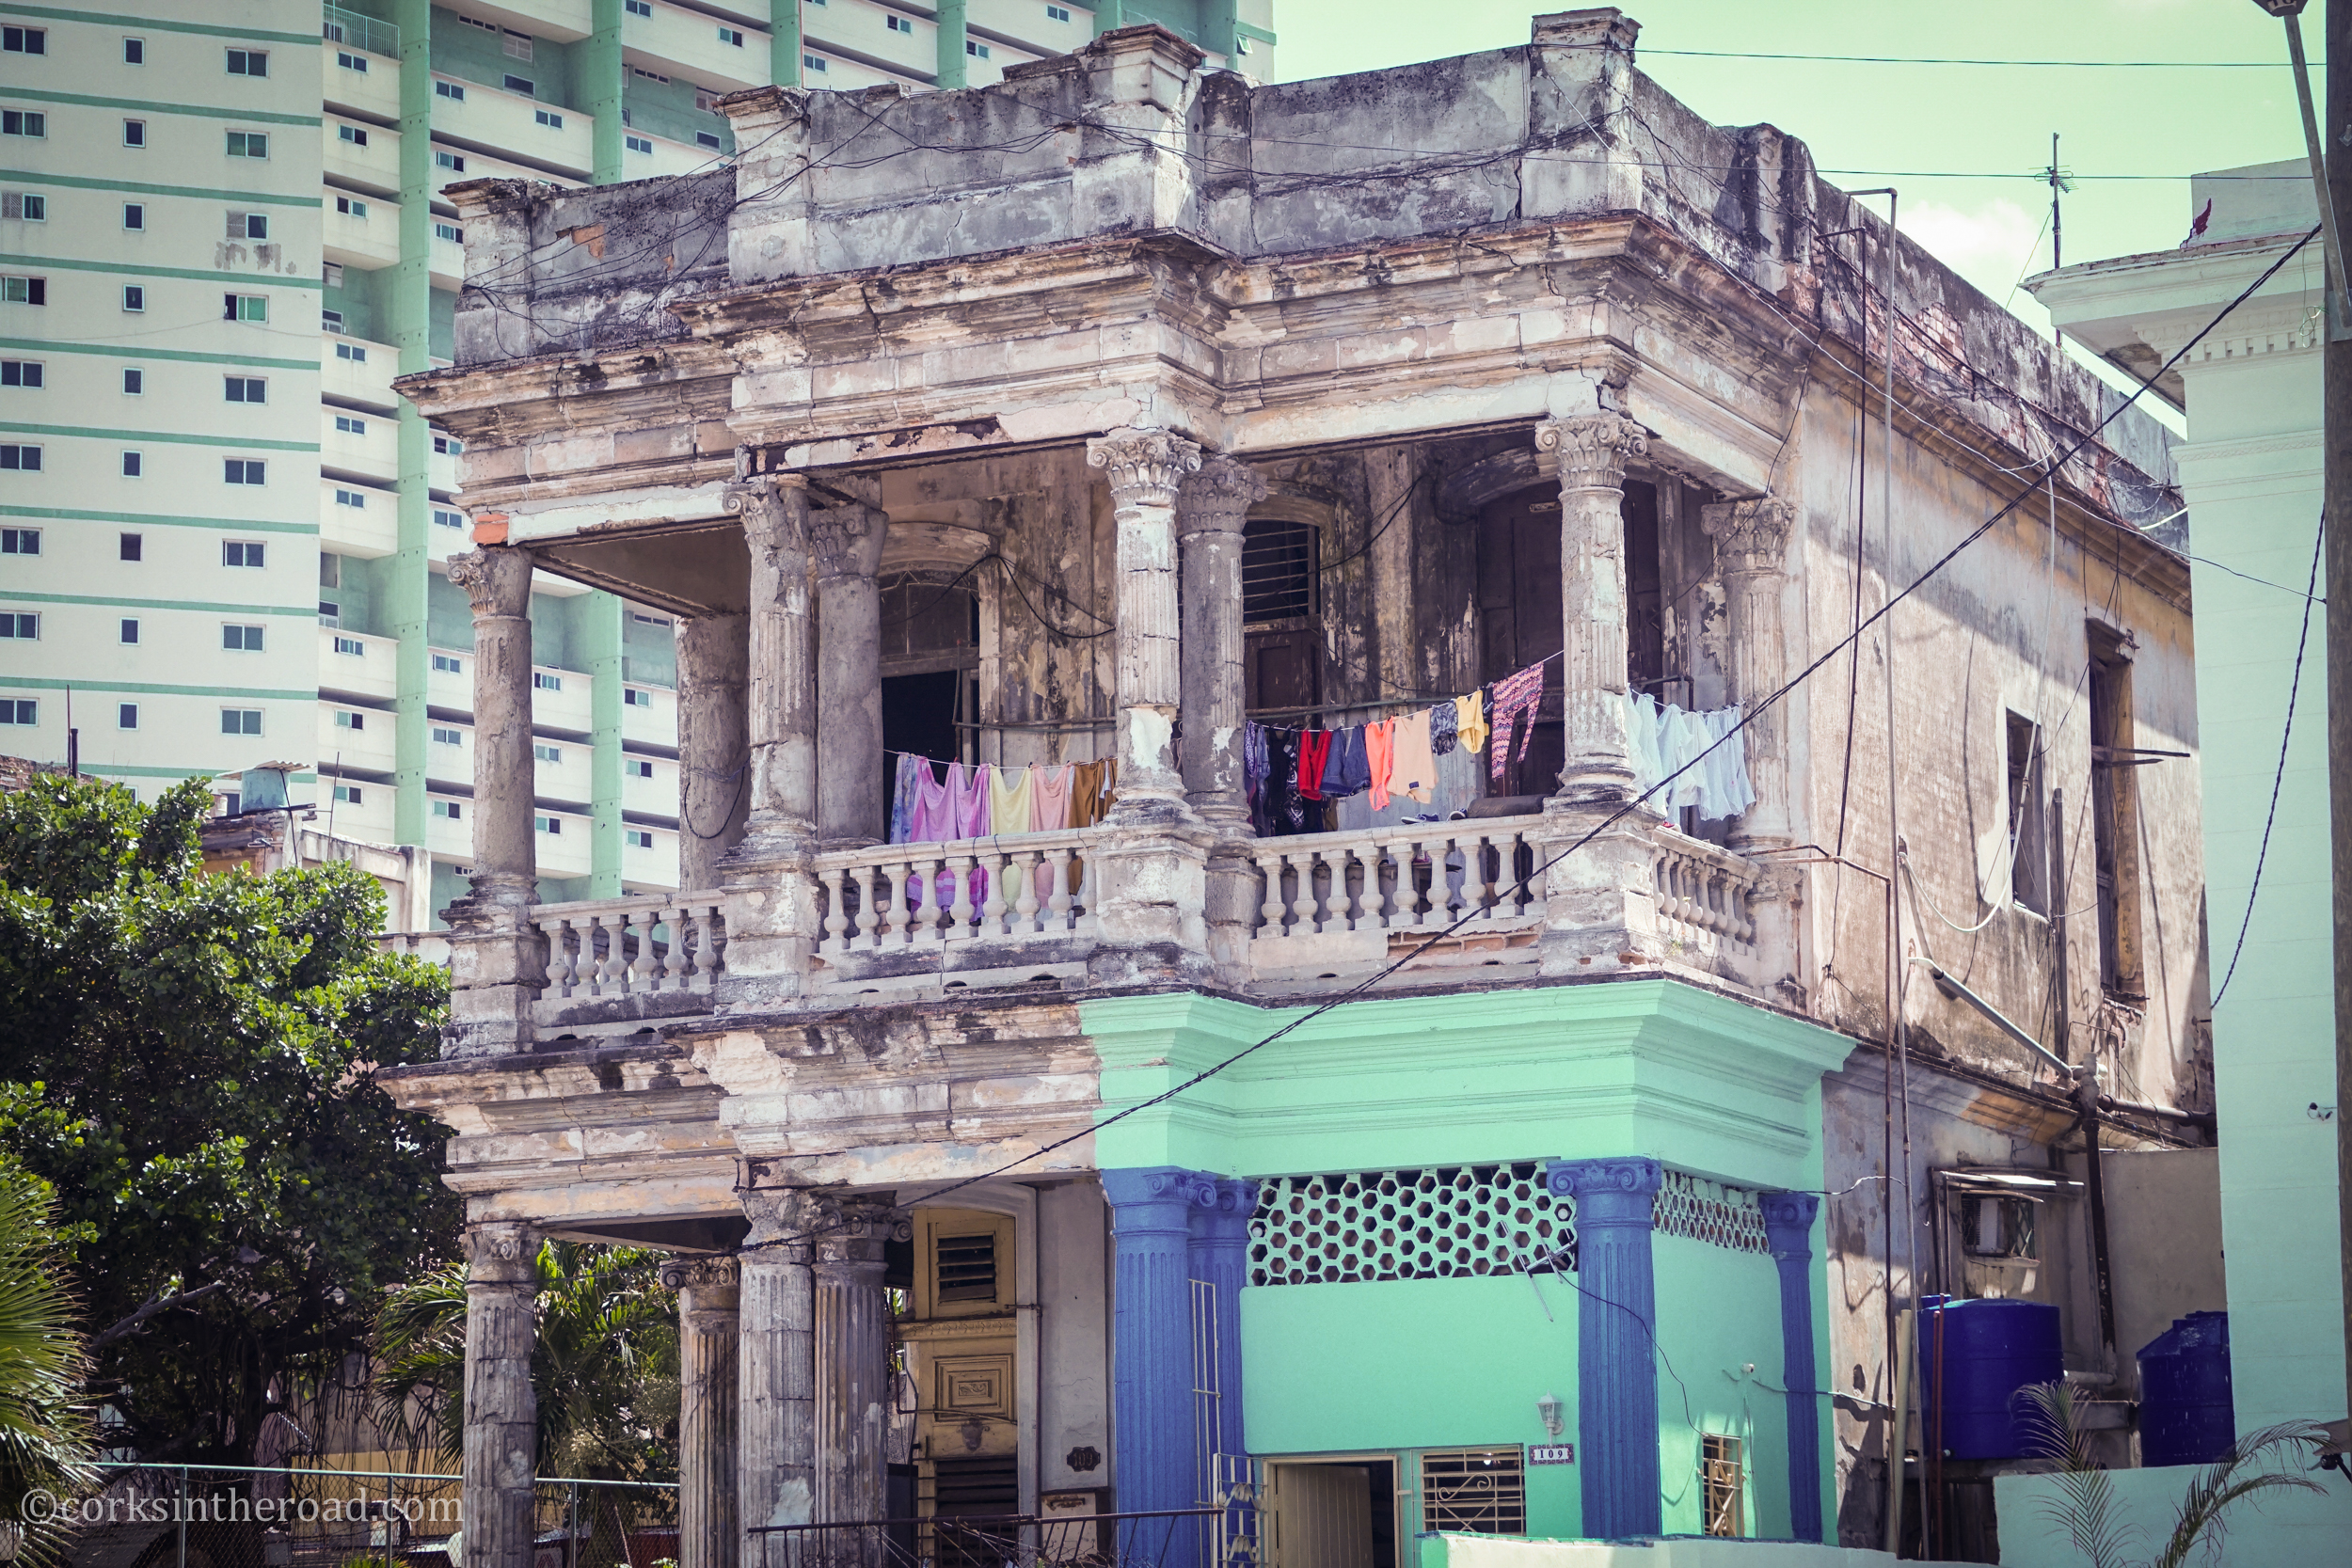 Architecture, Corksintheroad, Cuba, Havana.jpg